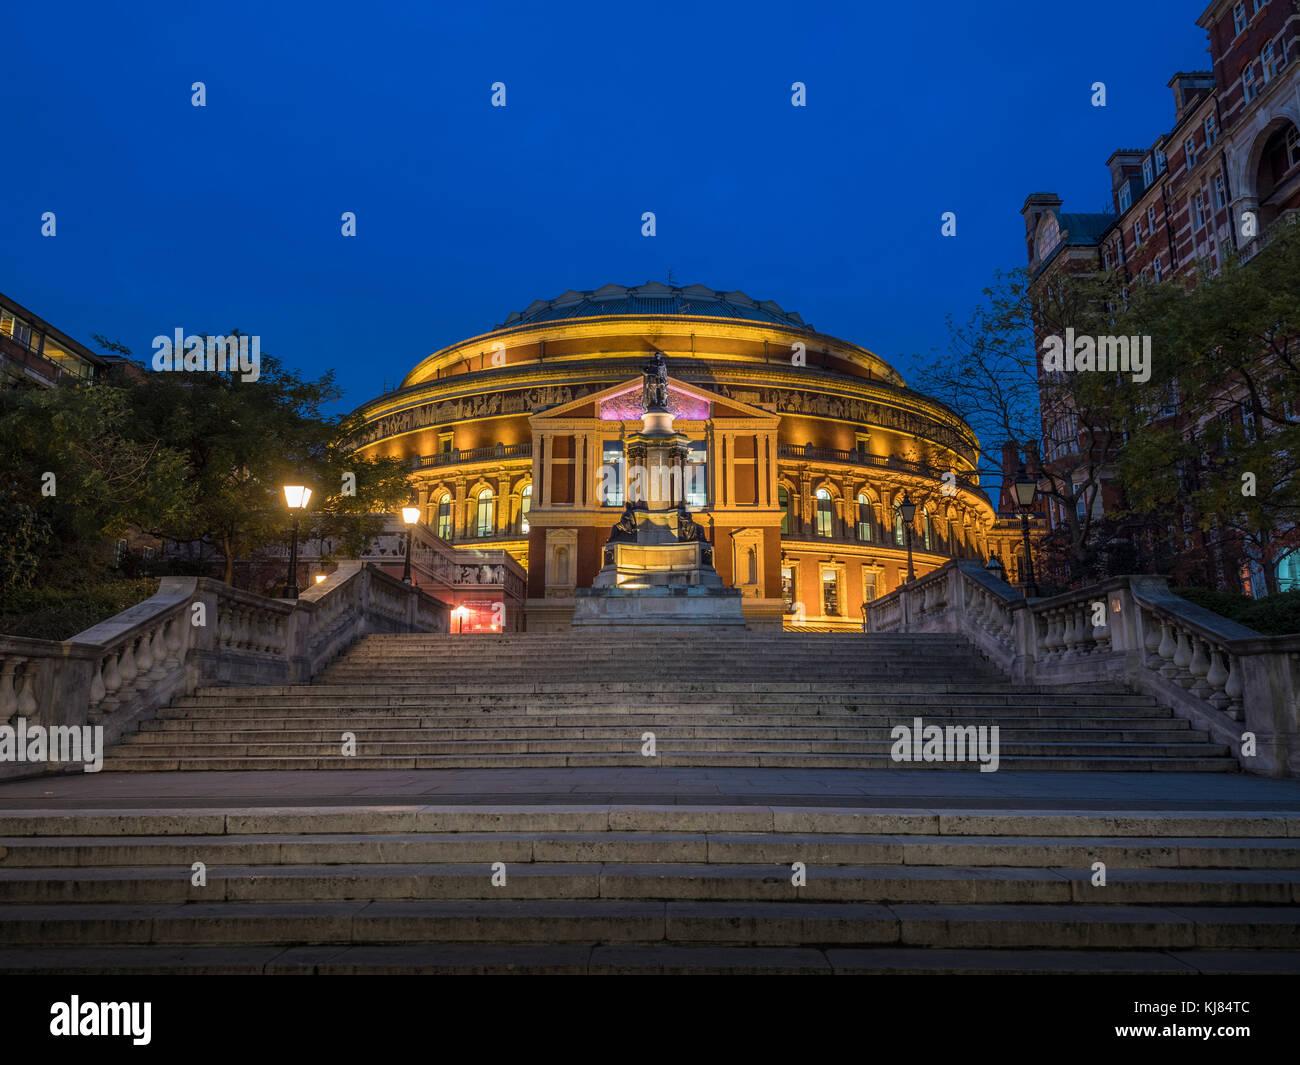 Queen Elizabeth II Diamond Jubilee Schritte, die Royal Albert Hall, London, UK in der Dämmerung Stockbild